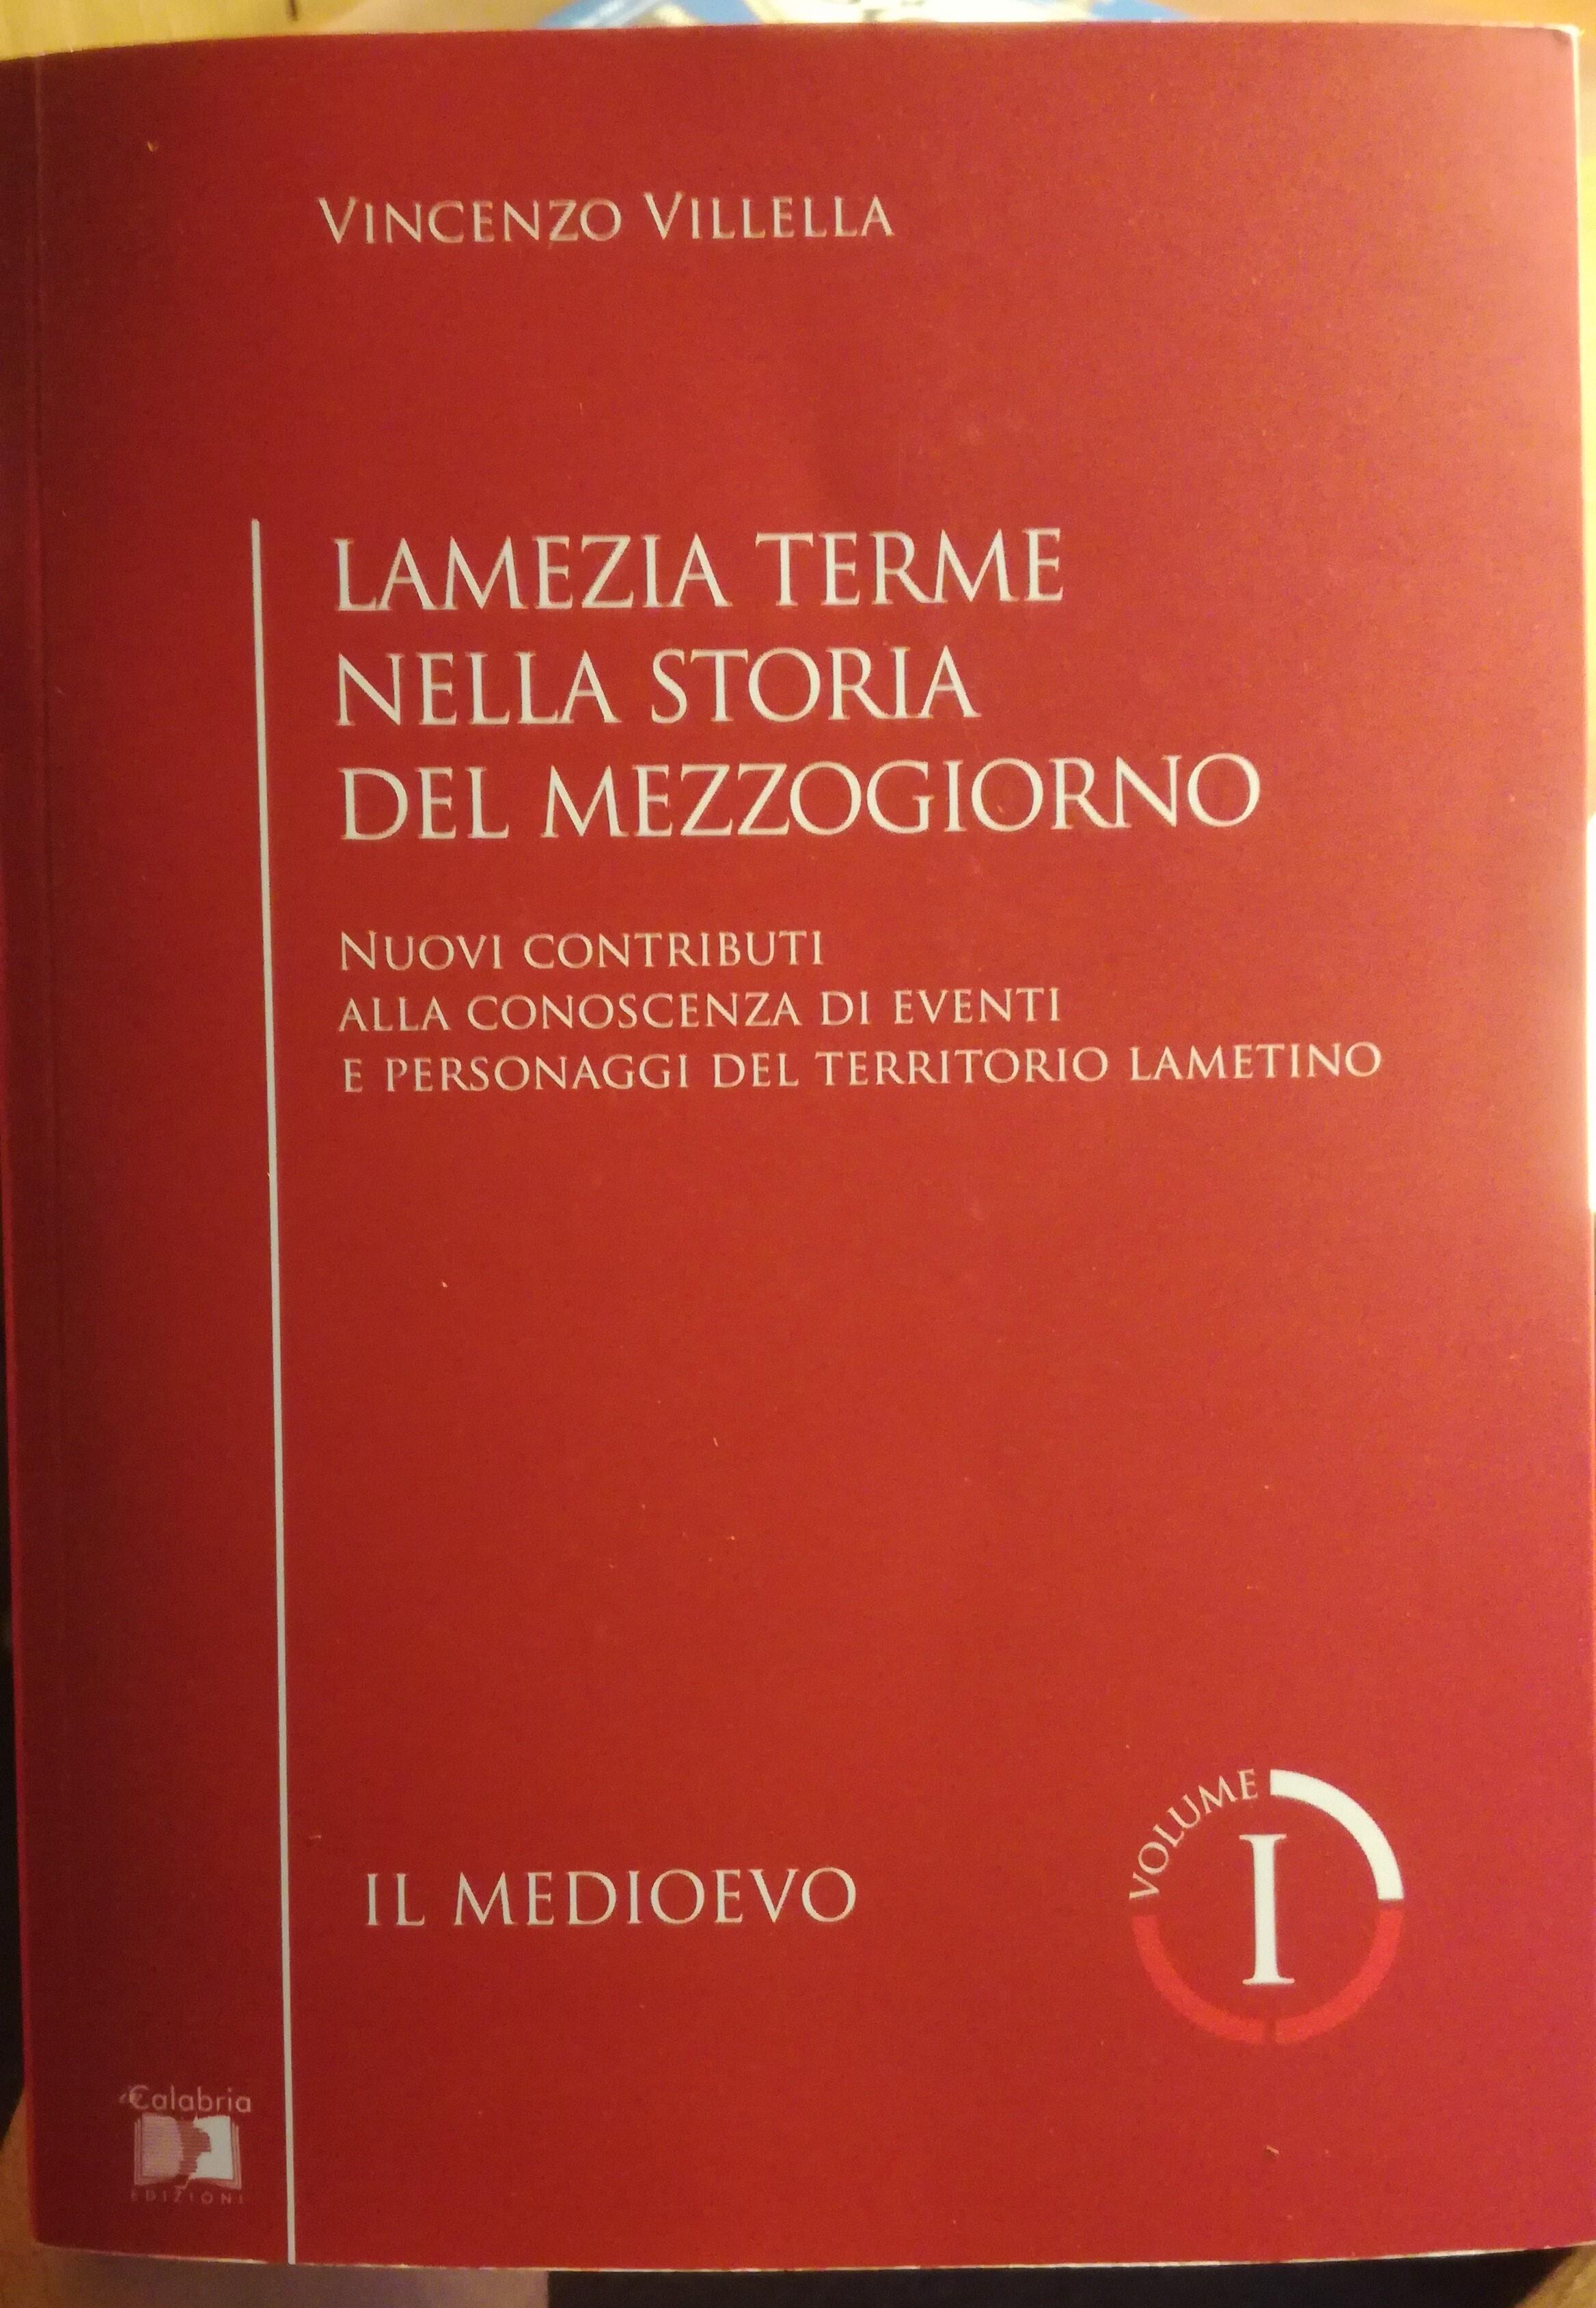 vincenzo villella-LameziaTermeit